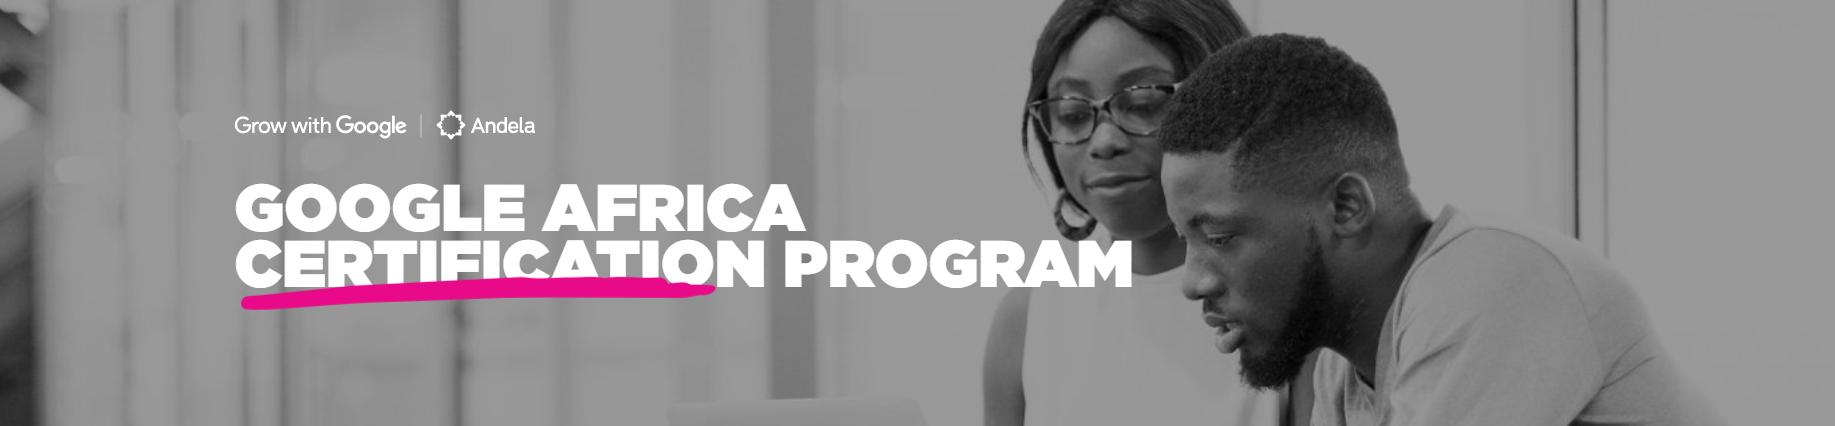 Google Africa Certification Program 2019